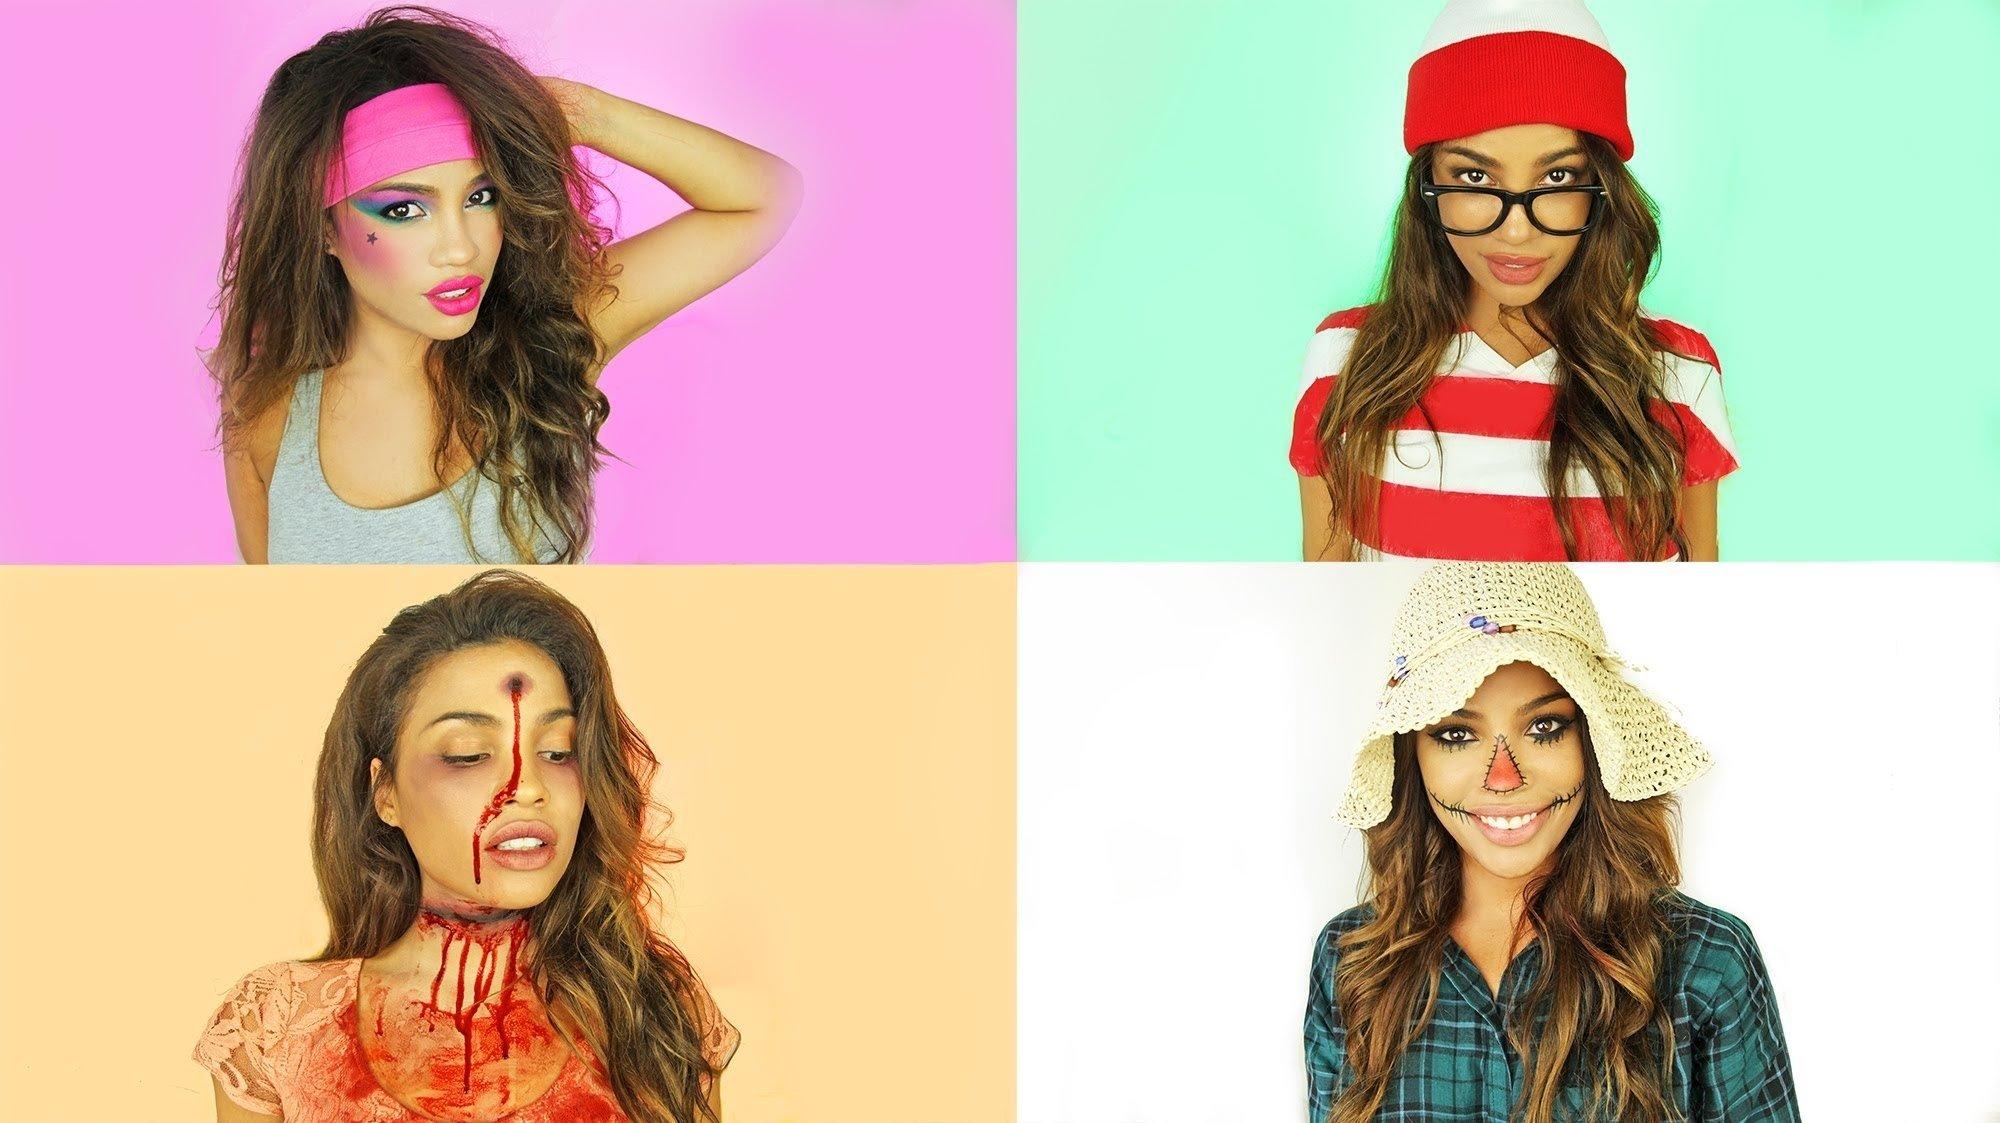 10 Gorgeous Easy Halloween Costume Ideas Women easy diy halloween costumes ideas andreaschoice youtube 55 2020